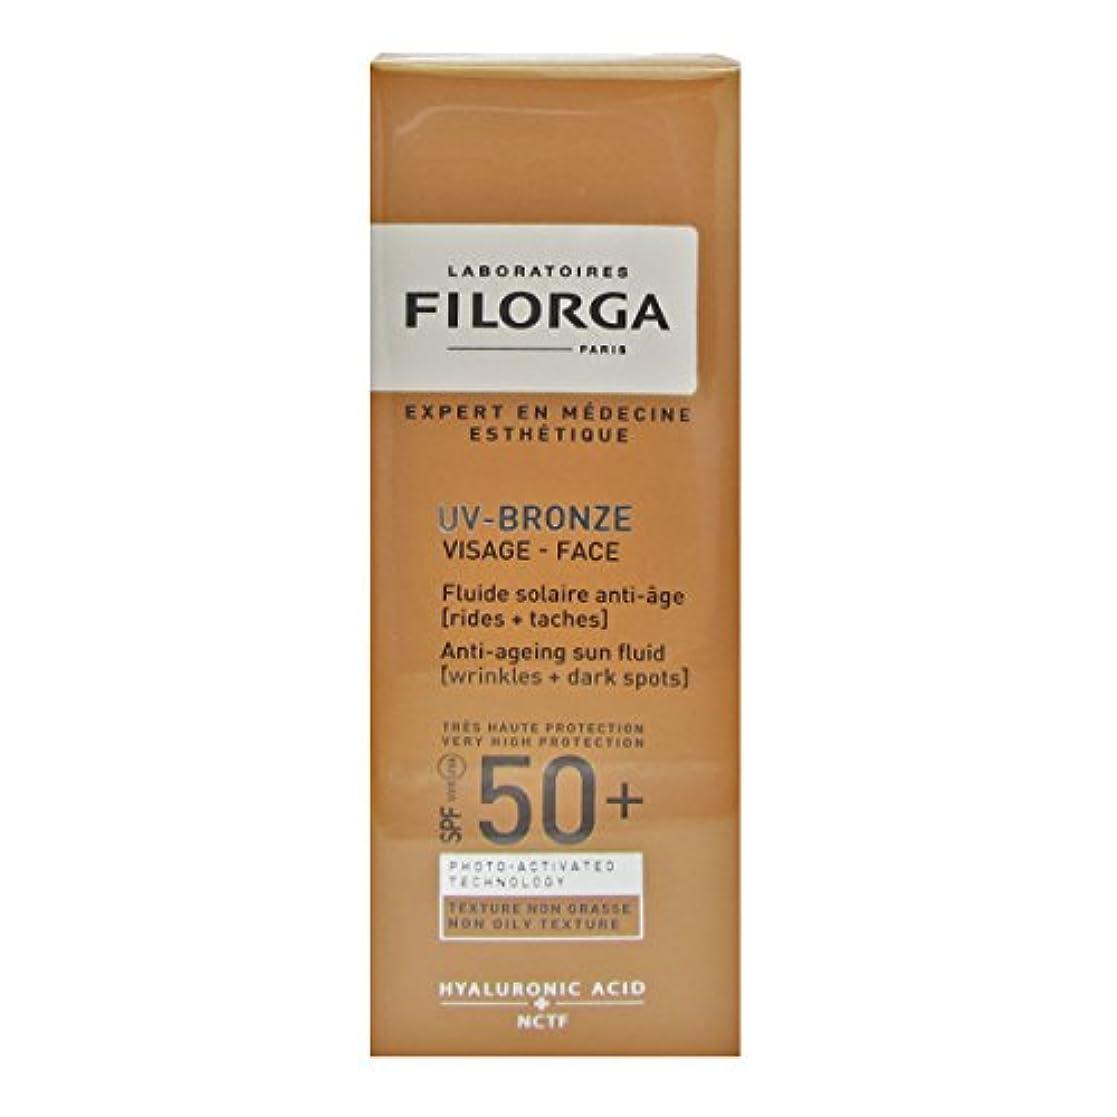 科学的ホラー家主Filorga Uv-bronze Face Fluid Spf50+ 40ml [並行輸入品]